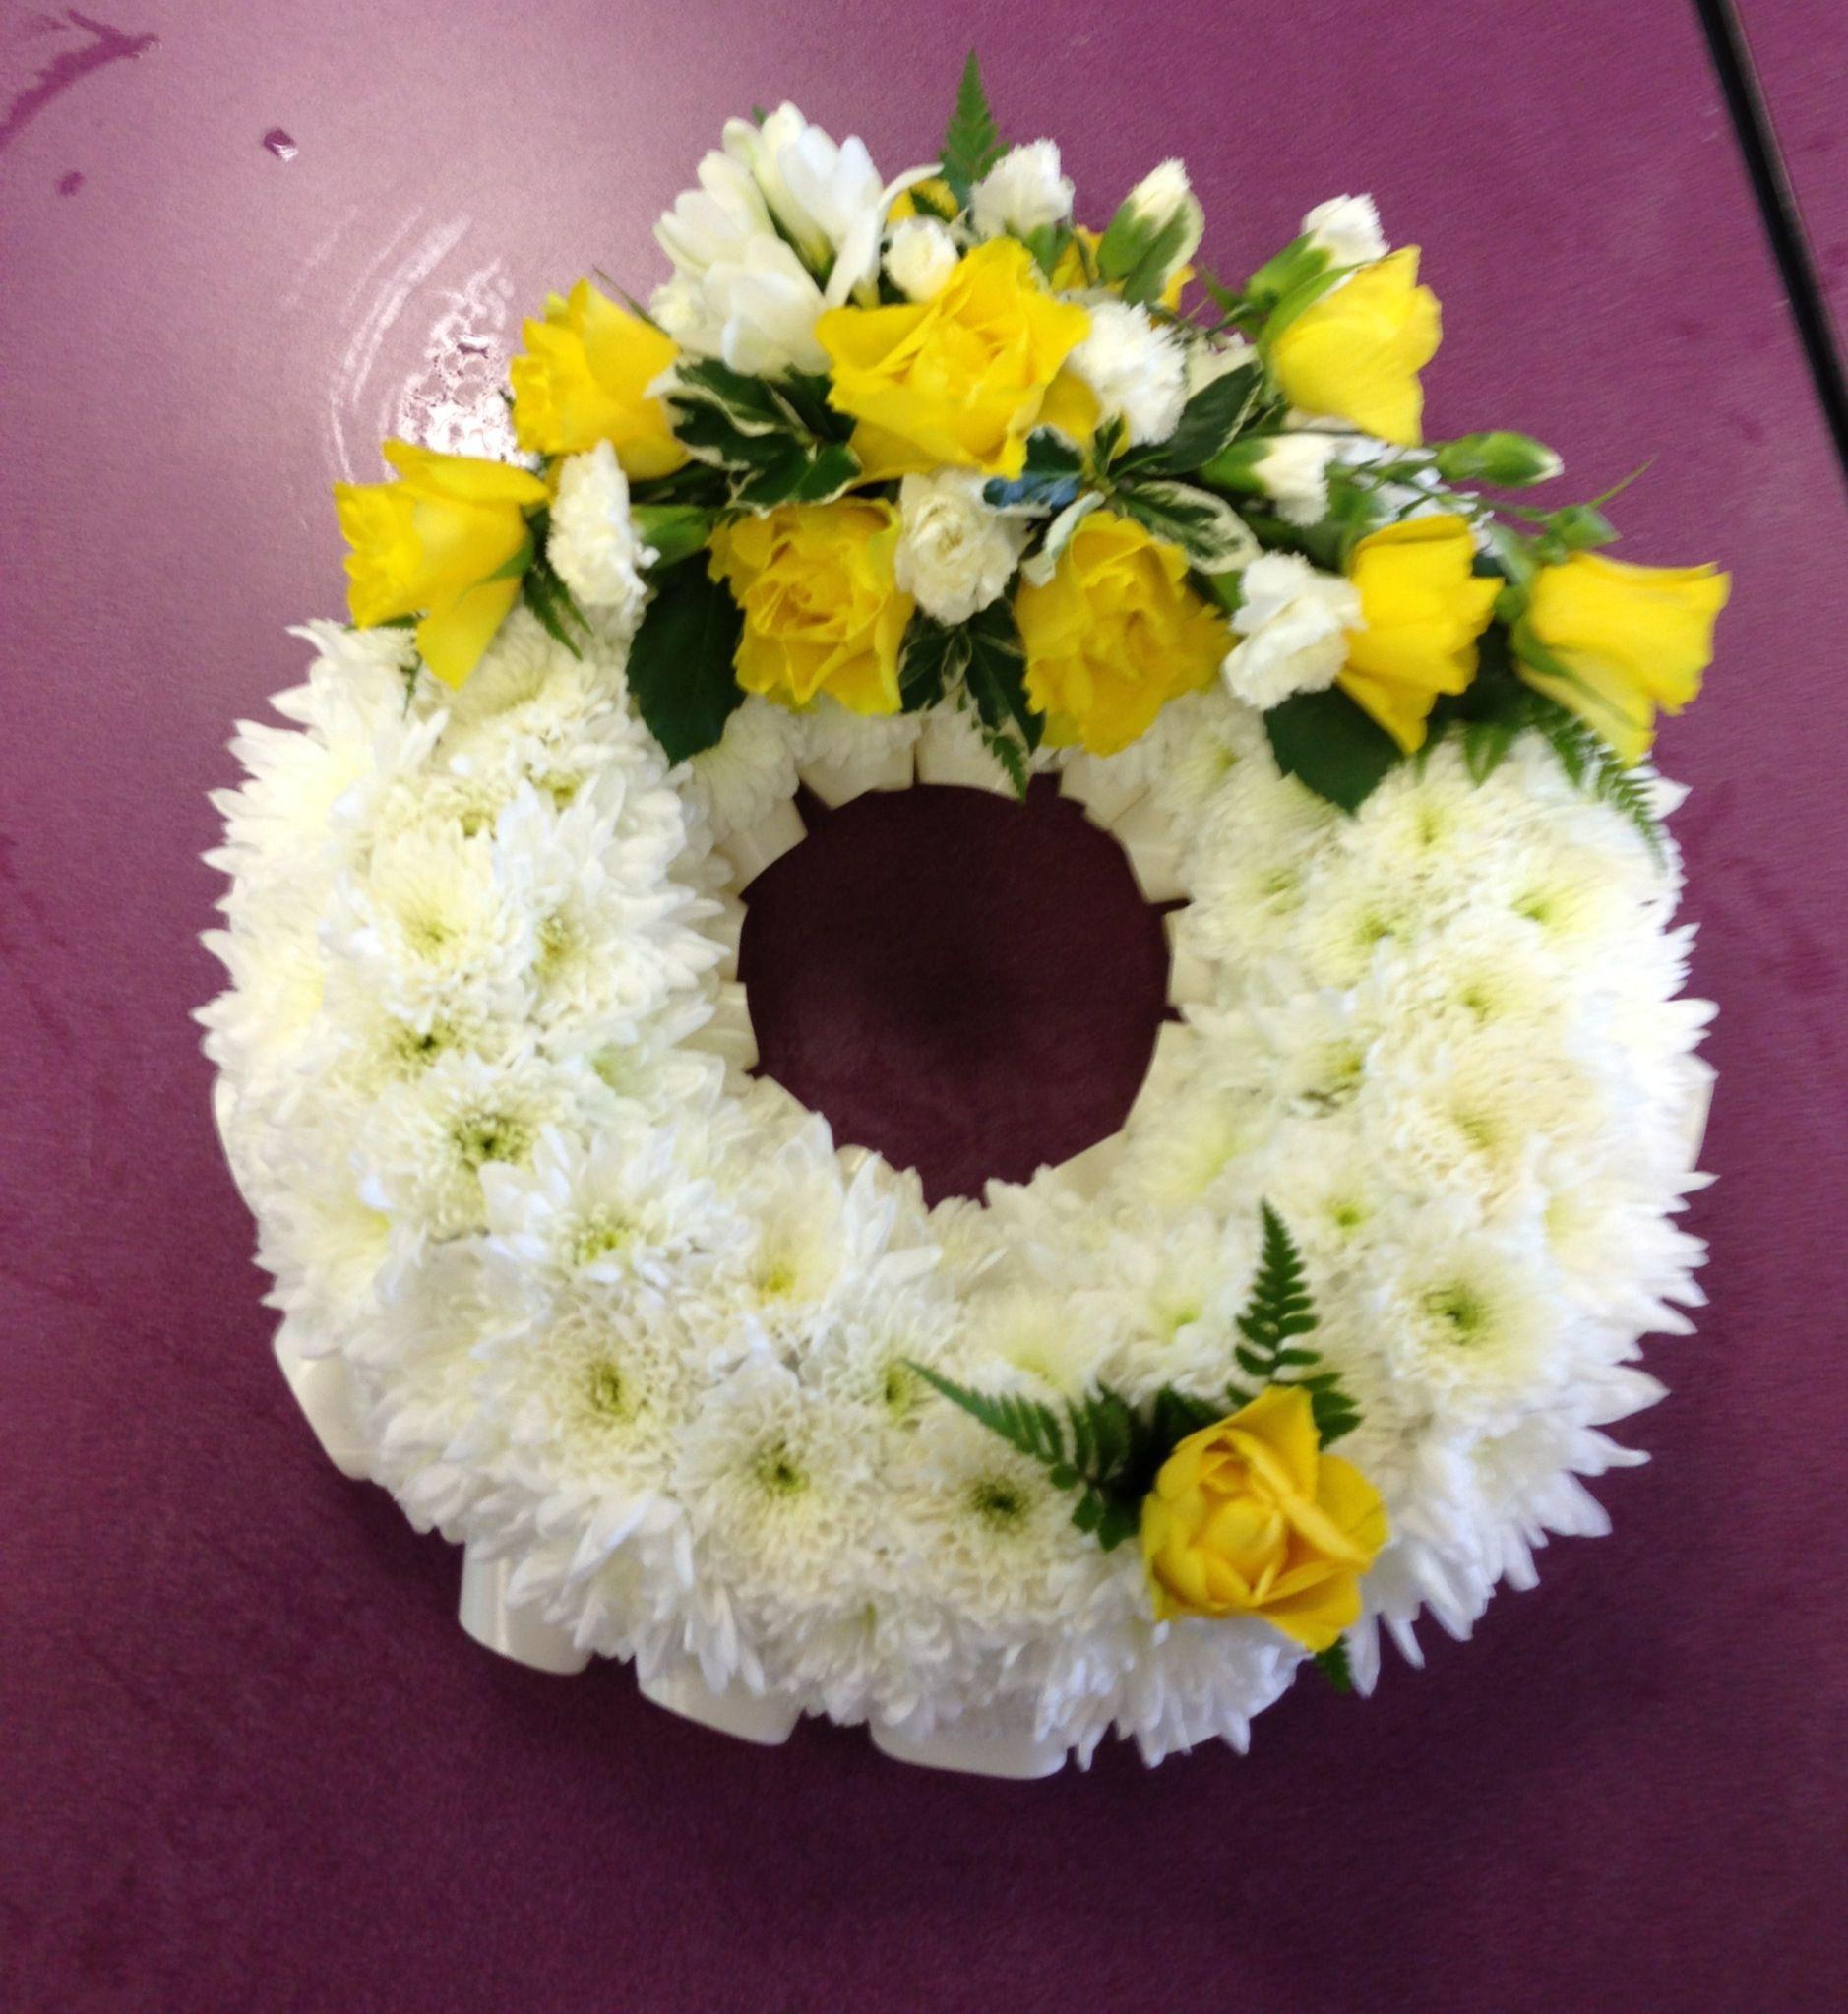 Funeral wreath floral design sympathy pinterest funeral funeral wreath izmirmasajfo Images